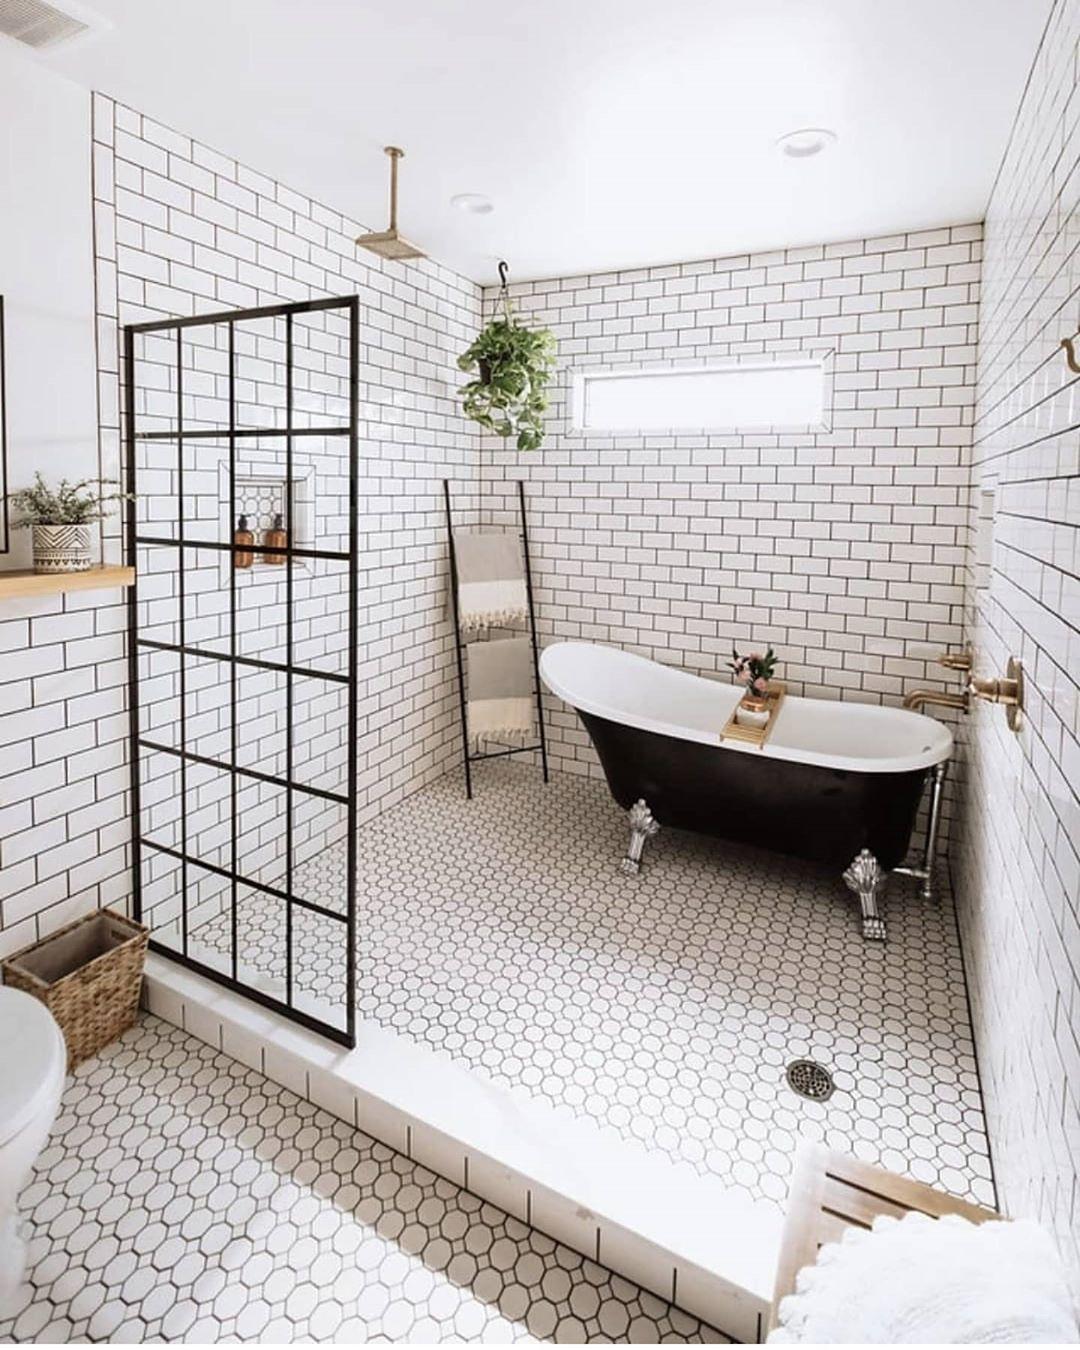 Burchard Design Co On Instagram Where All My High Maintenance Girls At Have You Guys Seen That Meme In 2020 Wet Rooms Spa Inspired Bathroom Frameless Shower Doors